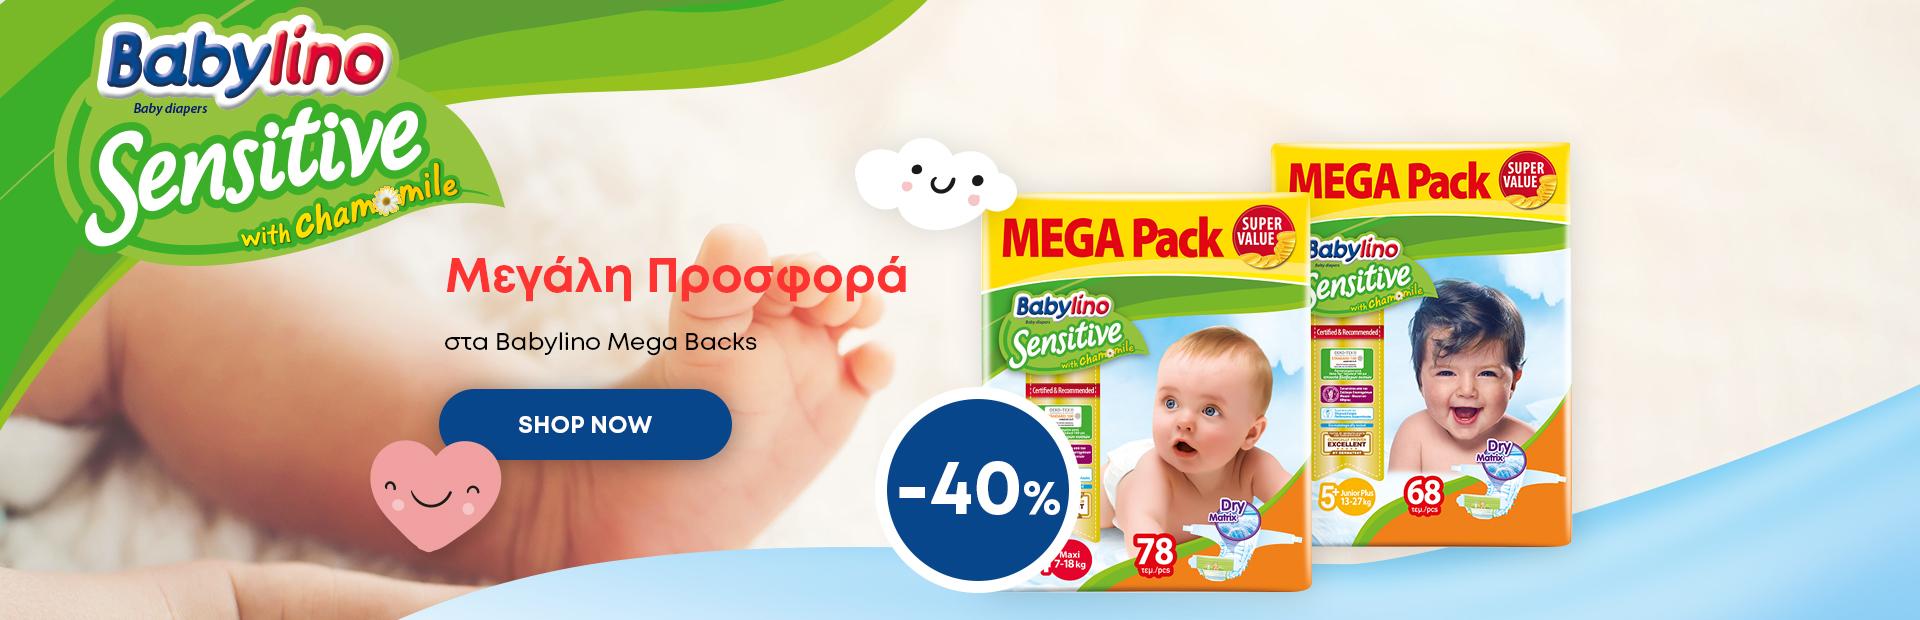 Babylino Sensitive Mega Pack 40%